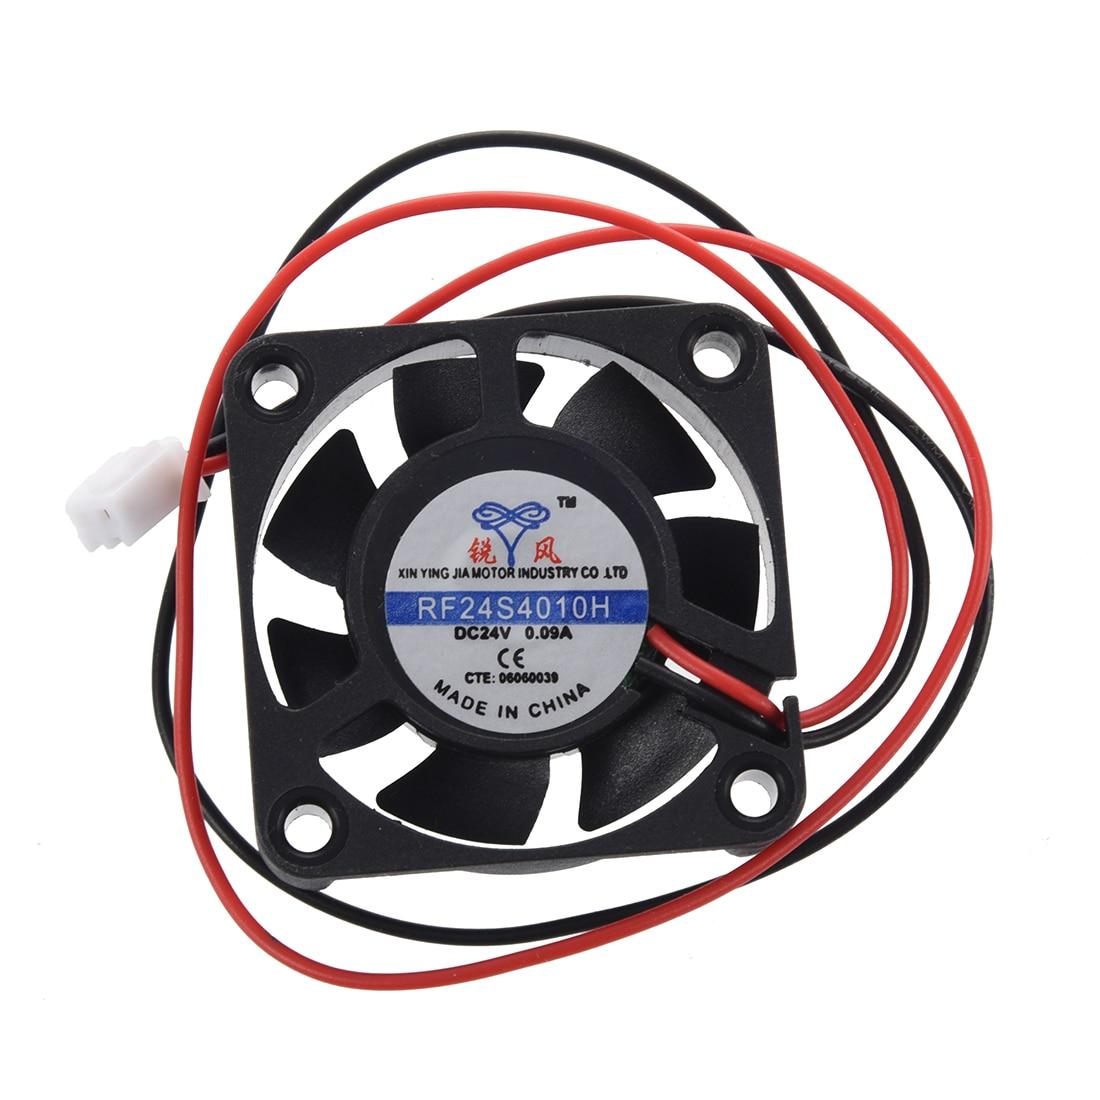 все цены на SODIAL(R) DC 24V 40 x 40 x 10mm 4010 7 Blade Brushless Cooling Fan онлайн